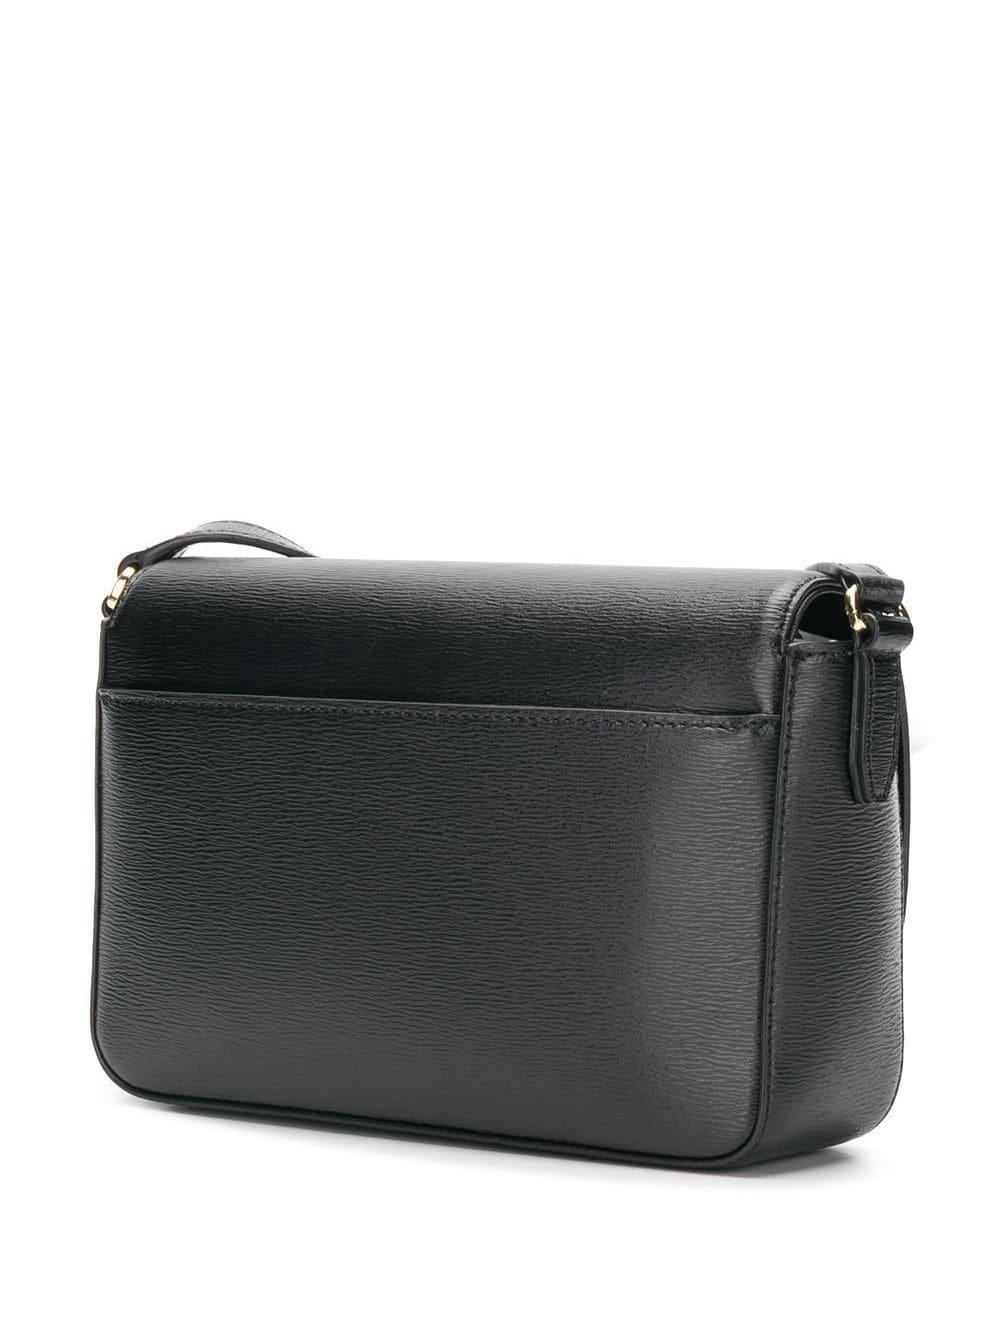 DKNY Leather Bryant Flap Cross Body Bag in Black